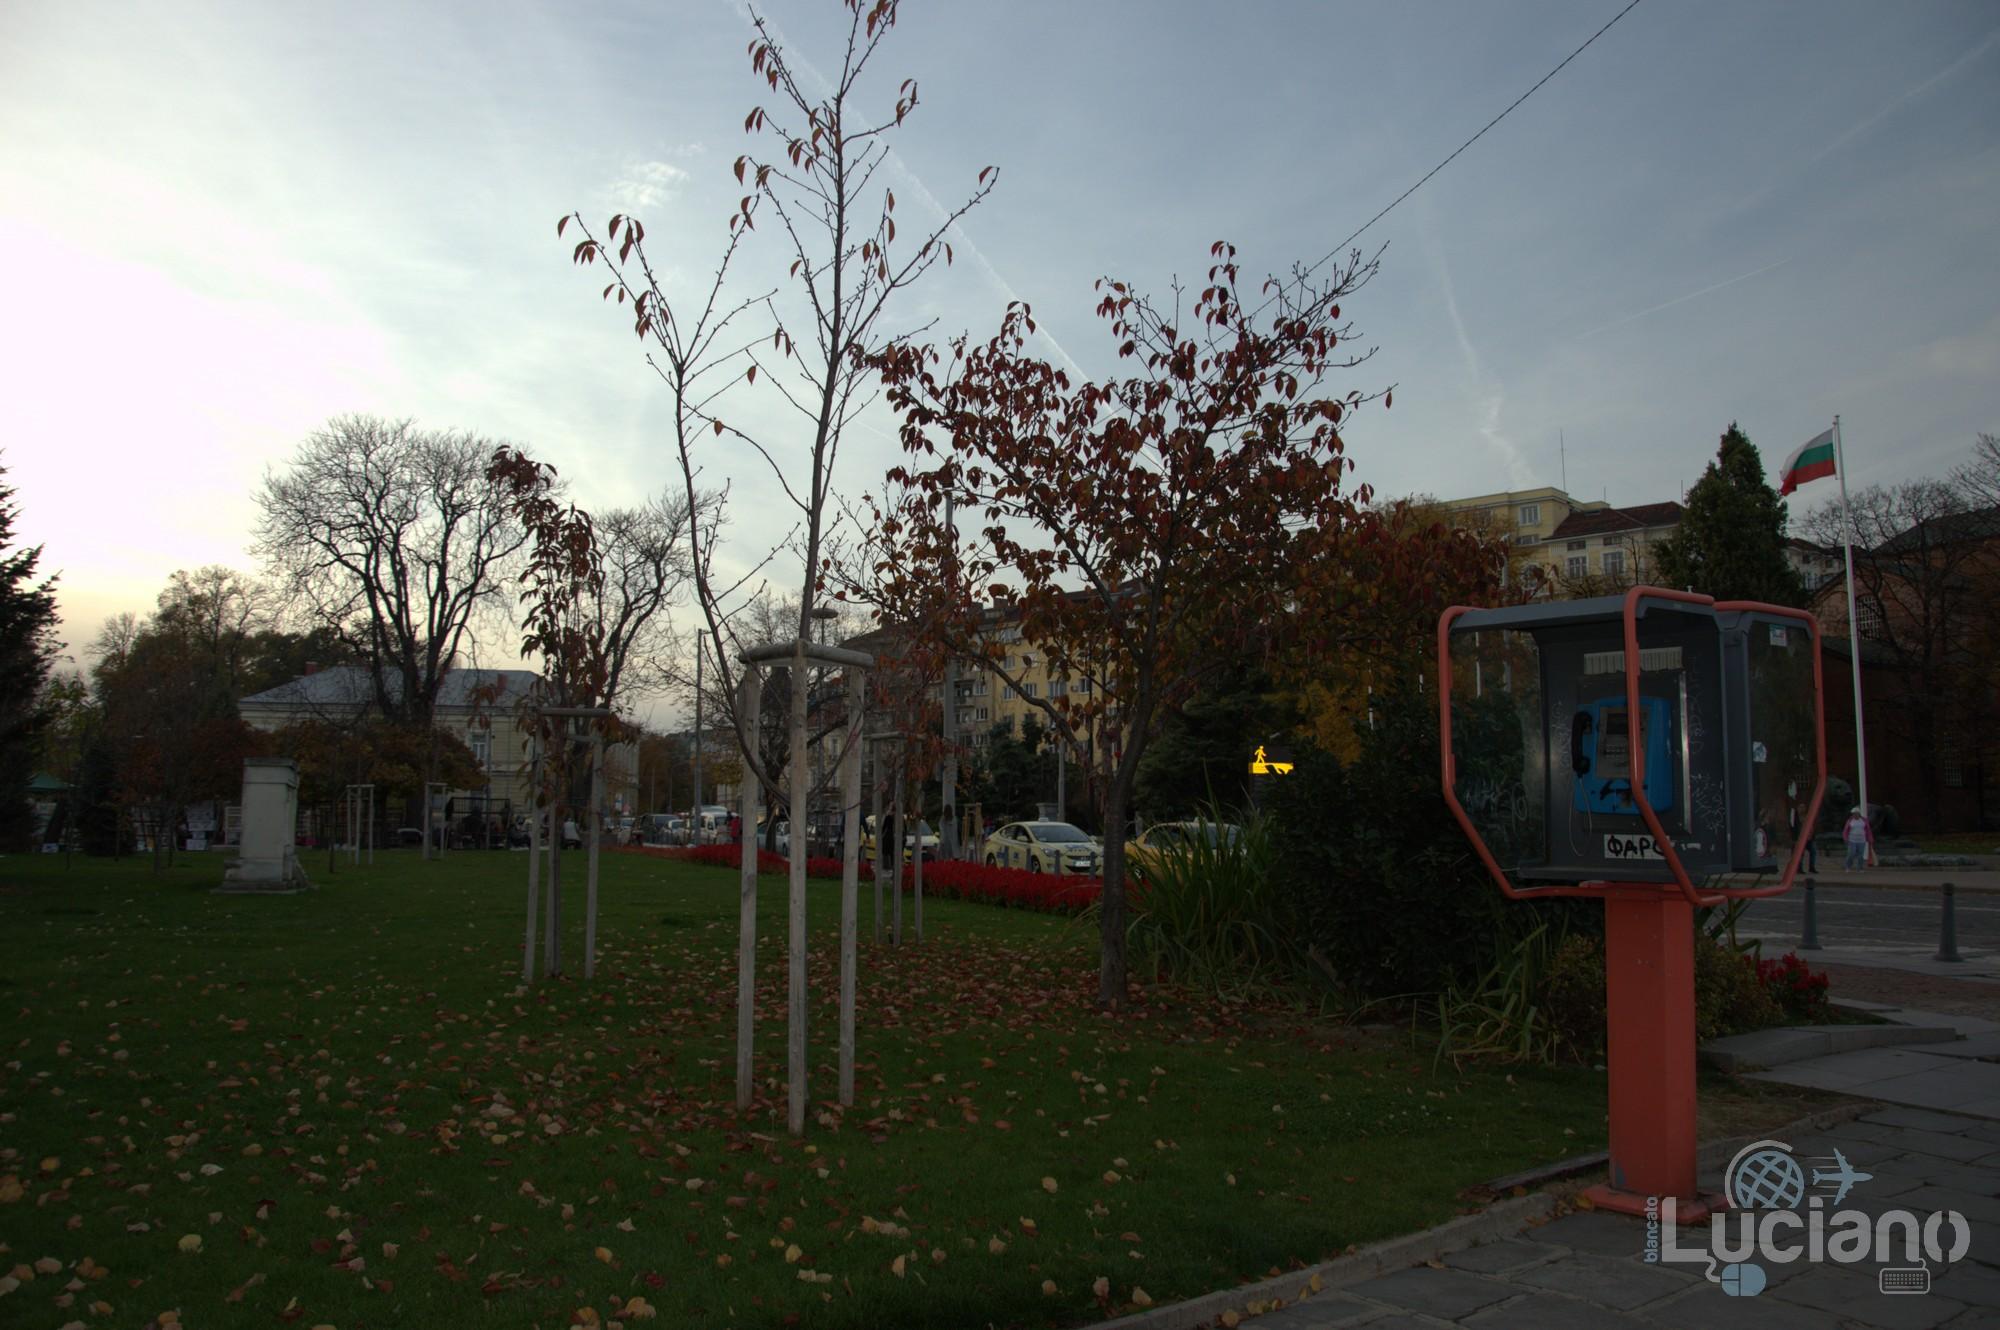 Parco - Sofia - Bulgaria